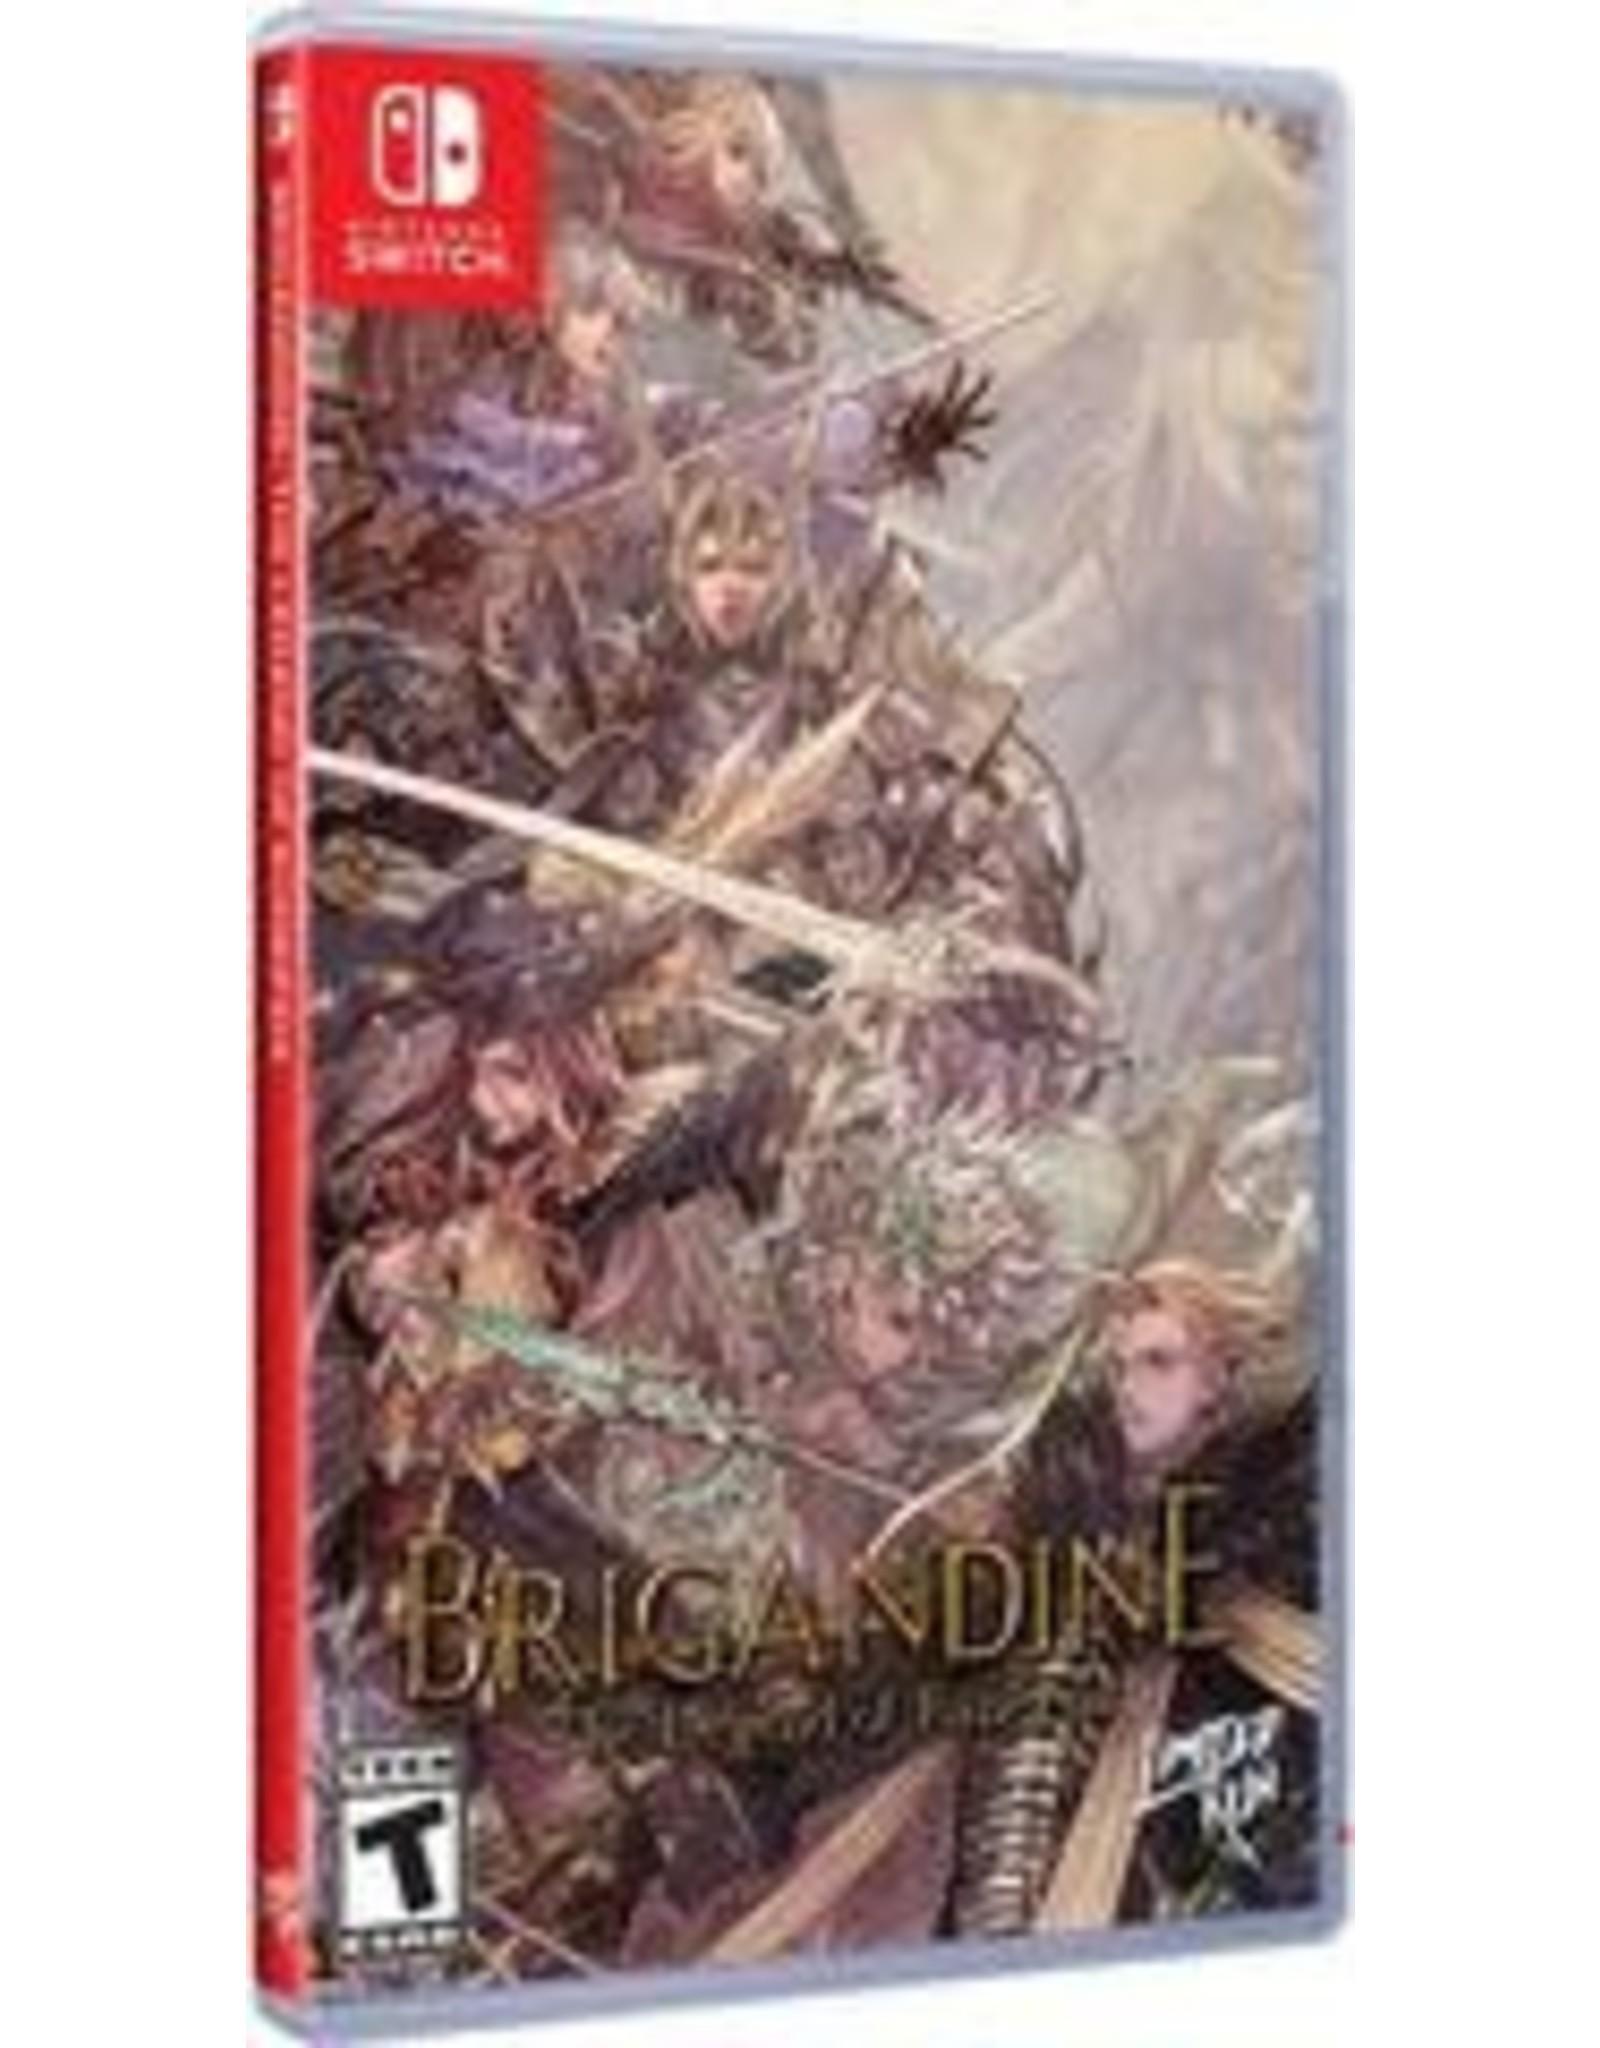 Nintendo Switch Brigandine: The Legend of Runersia (Used, LRG #71)